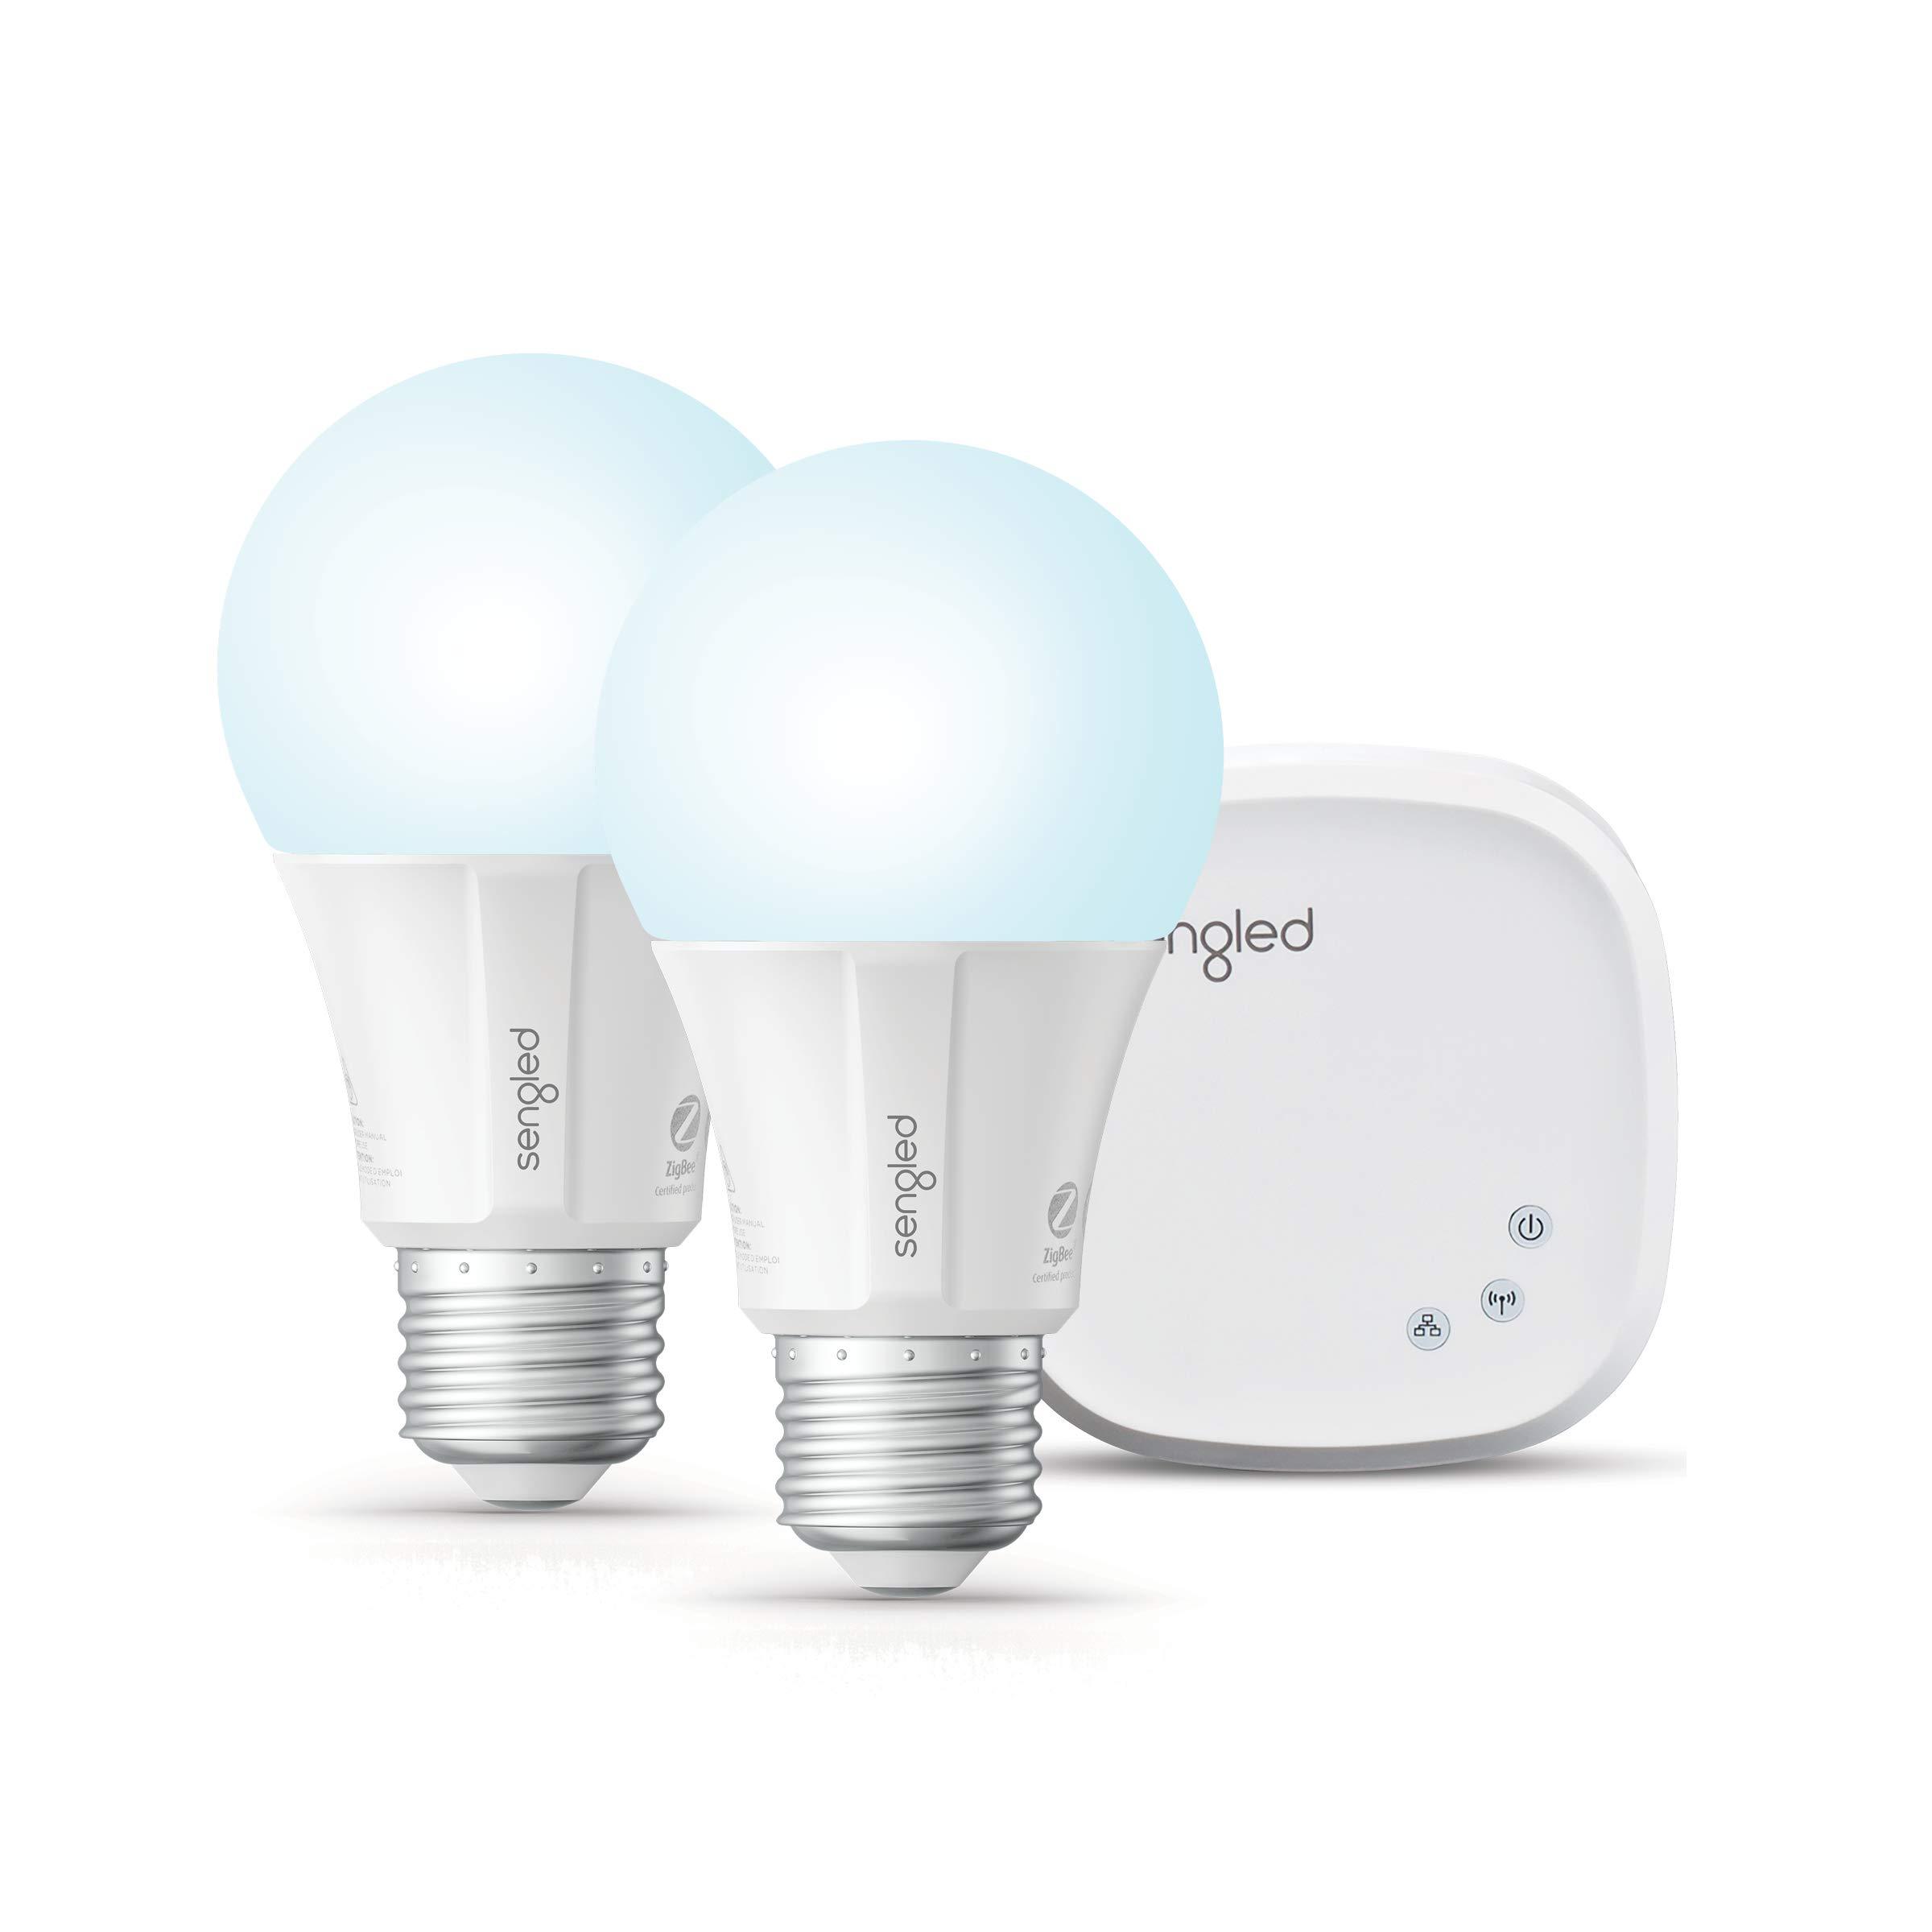 Sengled Smart LED Daylight A19 Starter Kit, 5000K 60W Equivalent, 2 Light Bulbs & Hub, Works with Alexa & Google Assistant